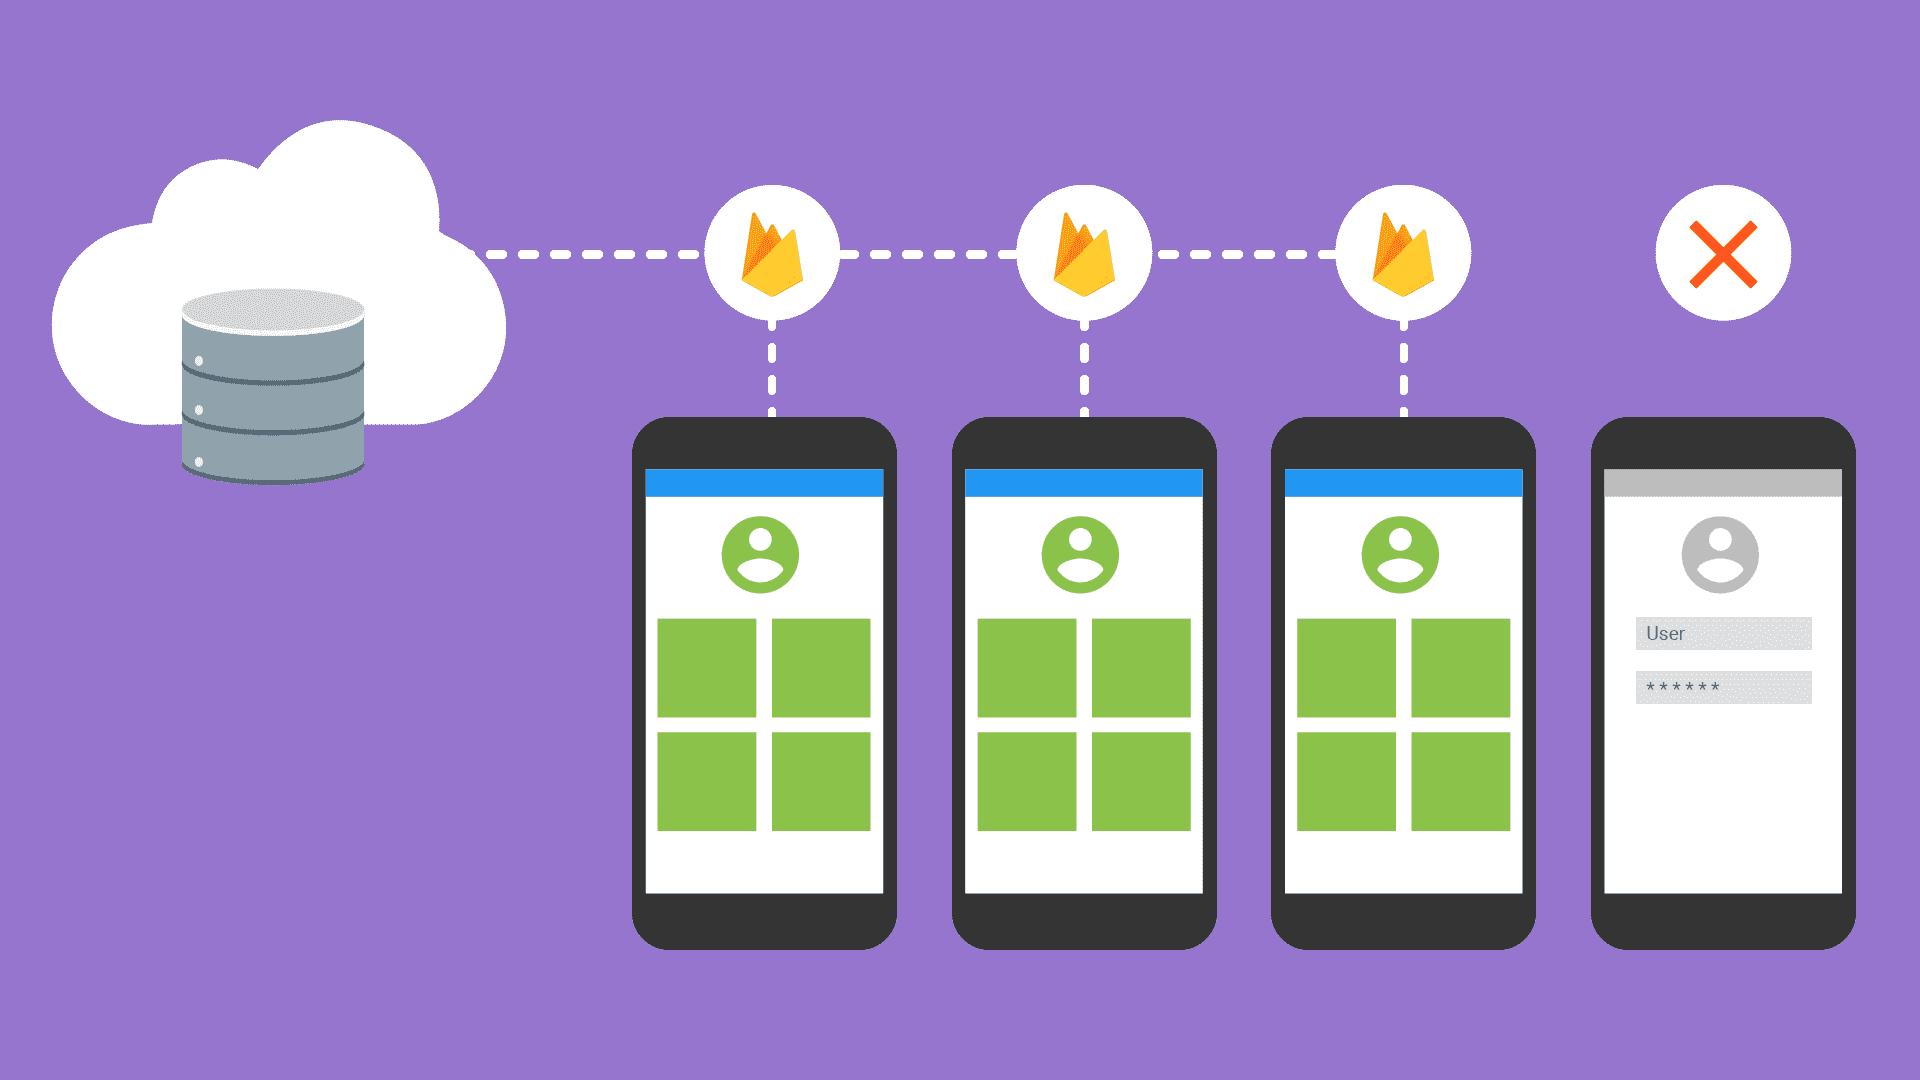 Multiple phone screens